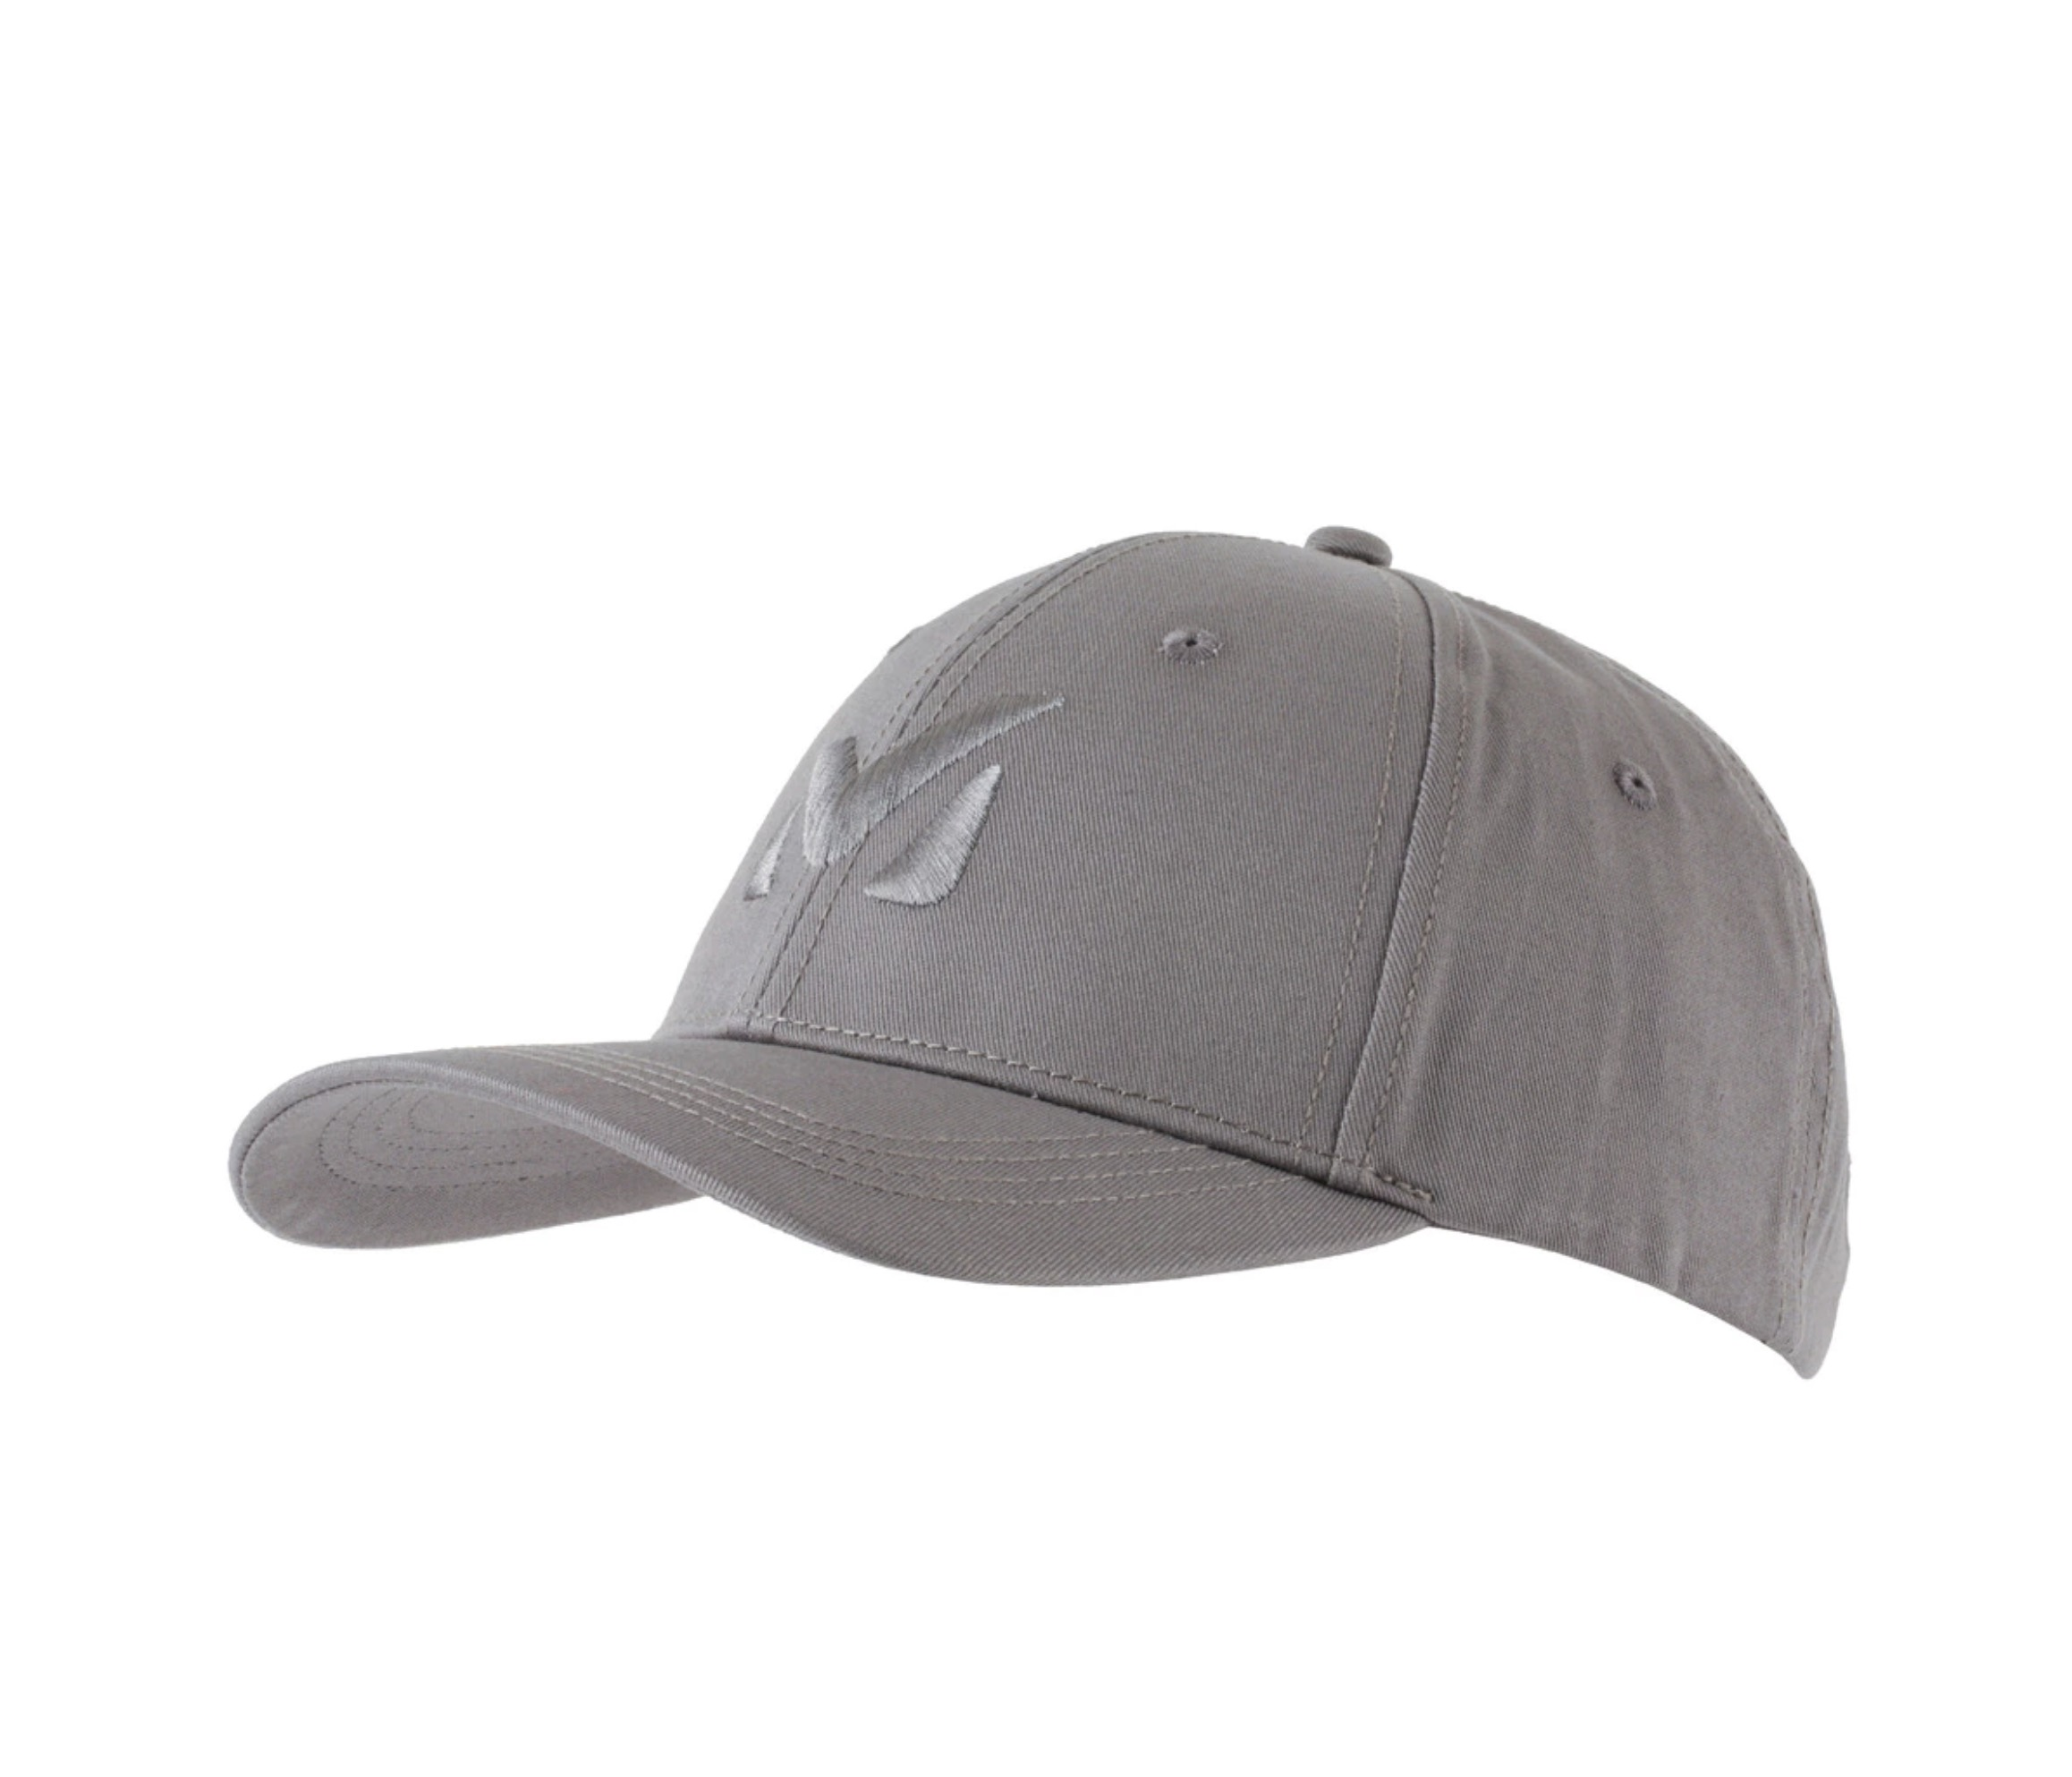 Millet Baseball Cap - Gorra